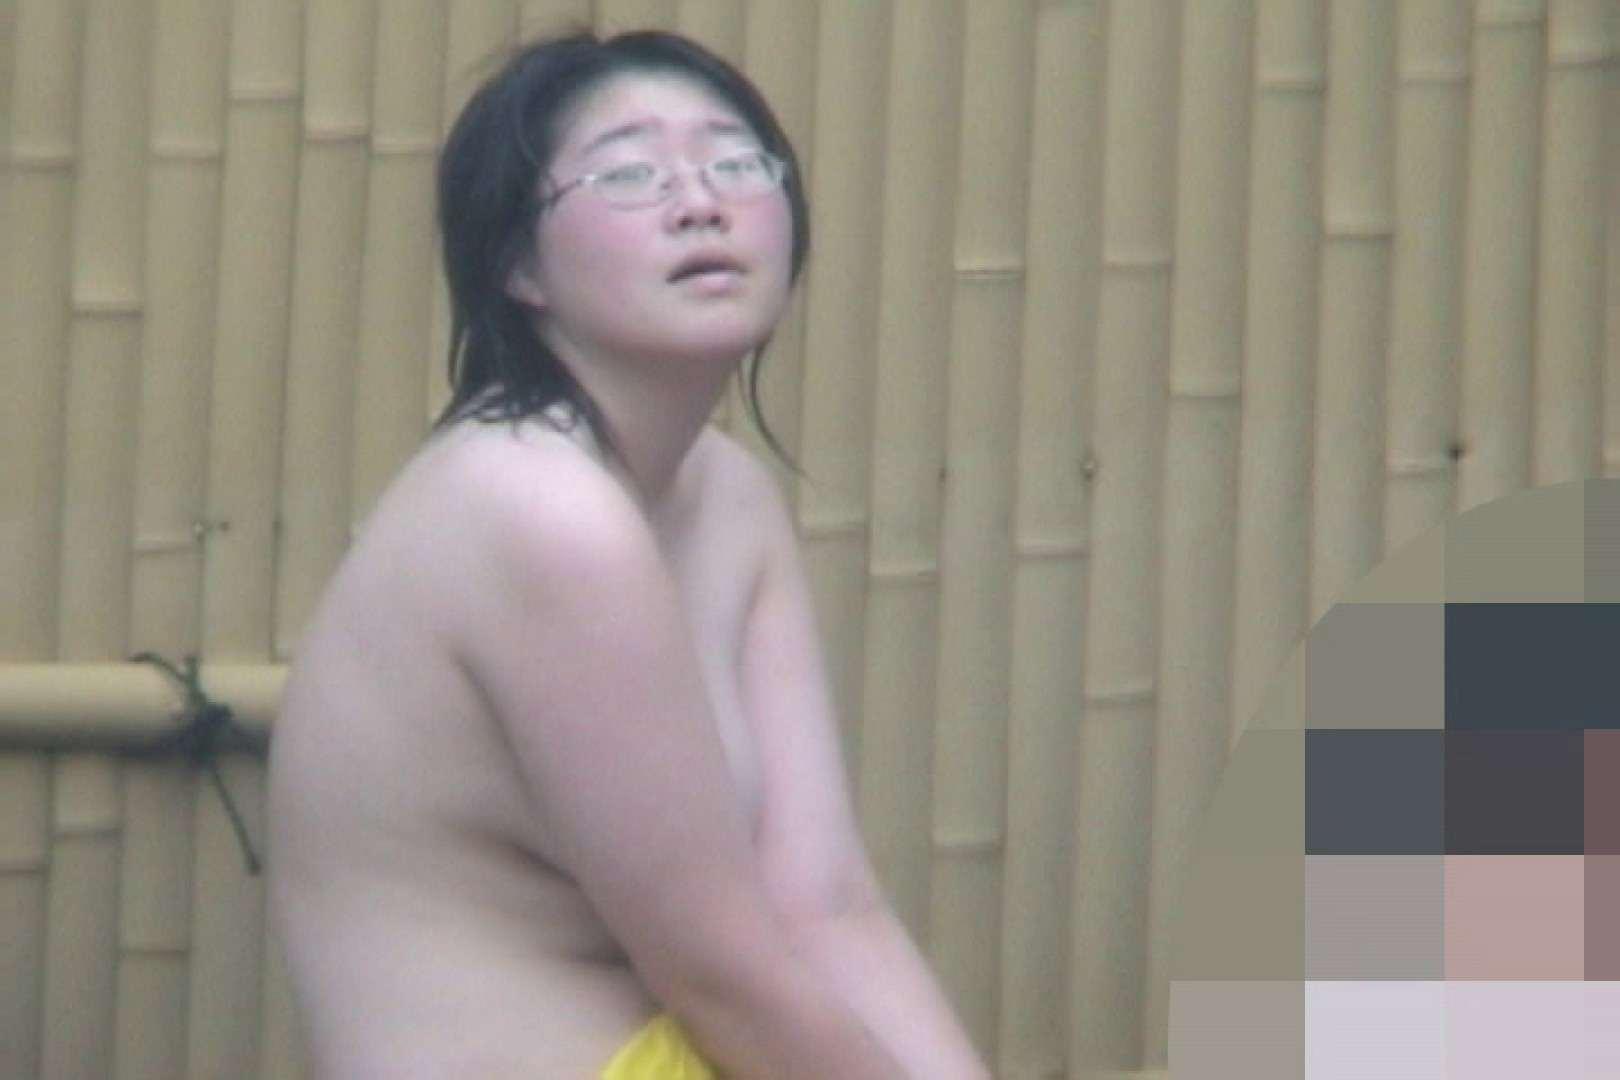 Aquaな露天風呂Vol.46【VIP限定】 HなOL | 露天  90pic 25